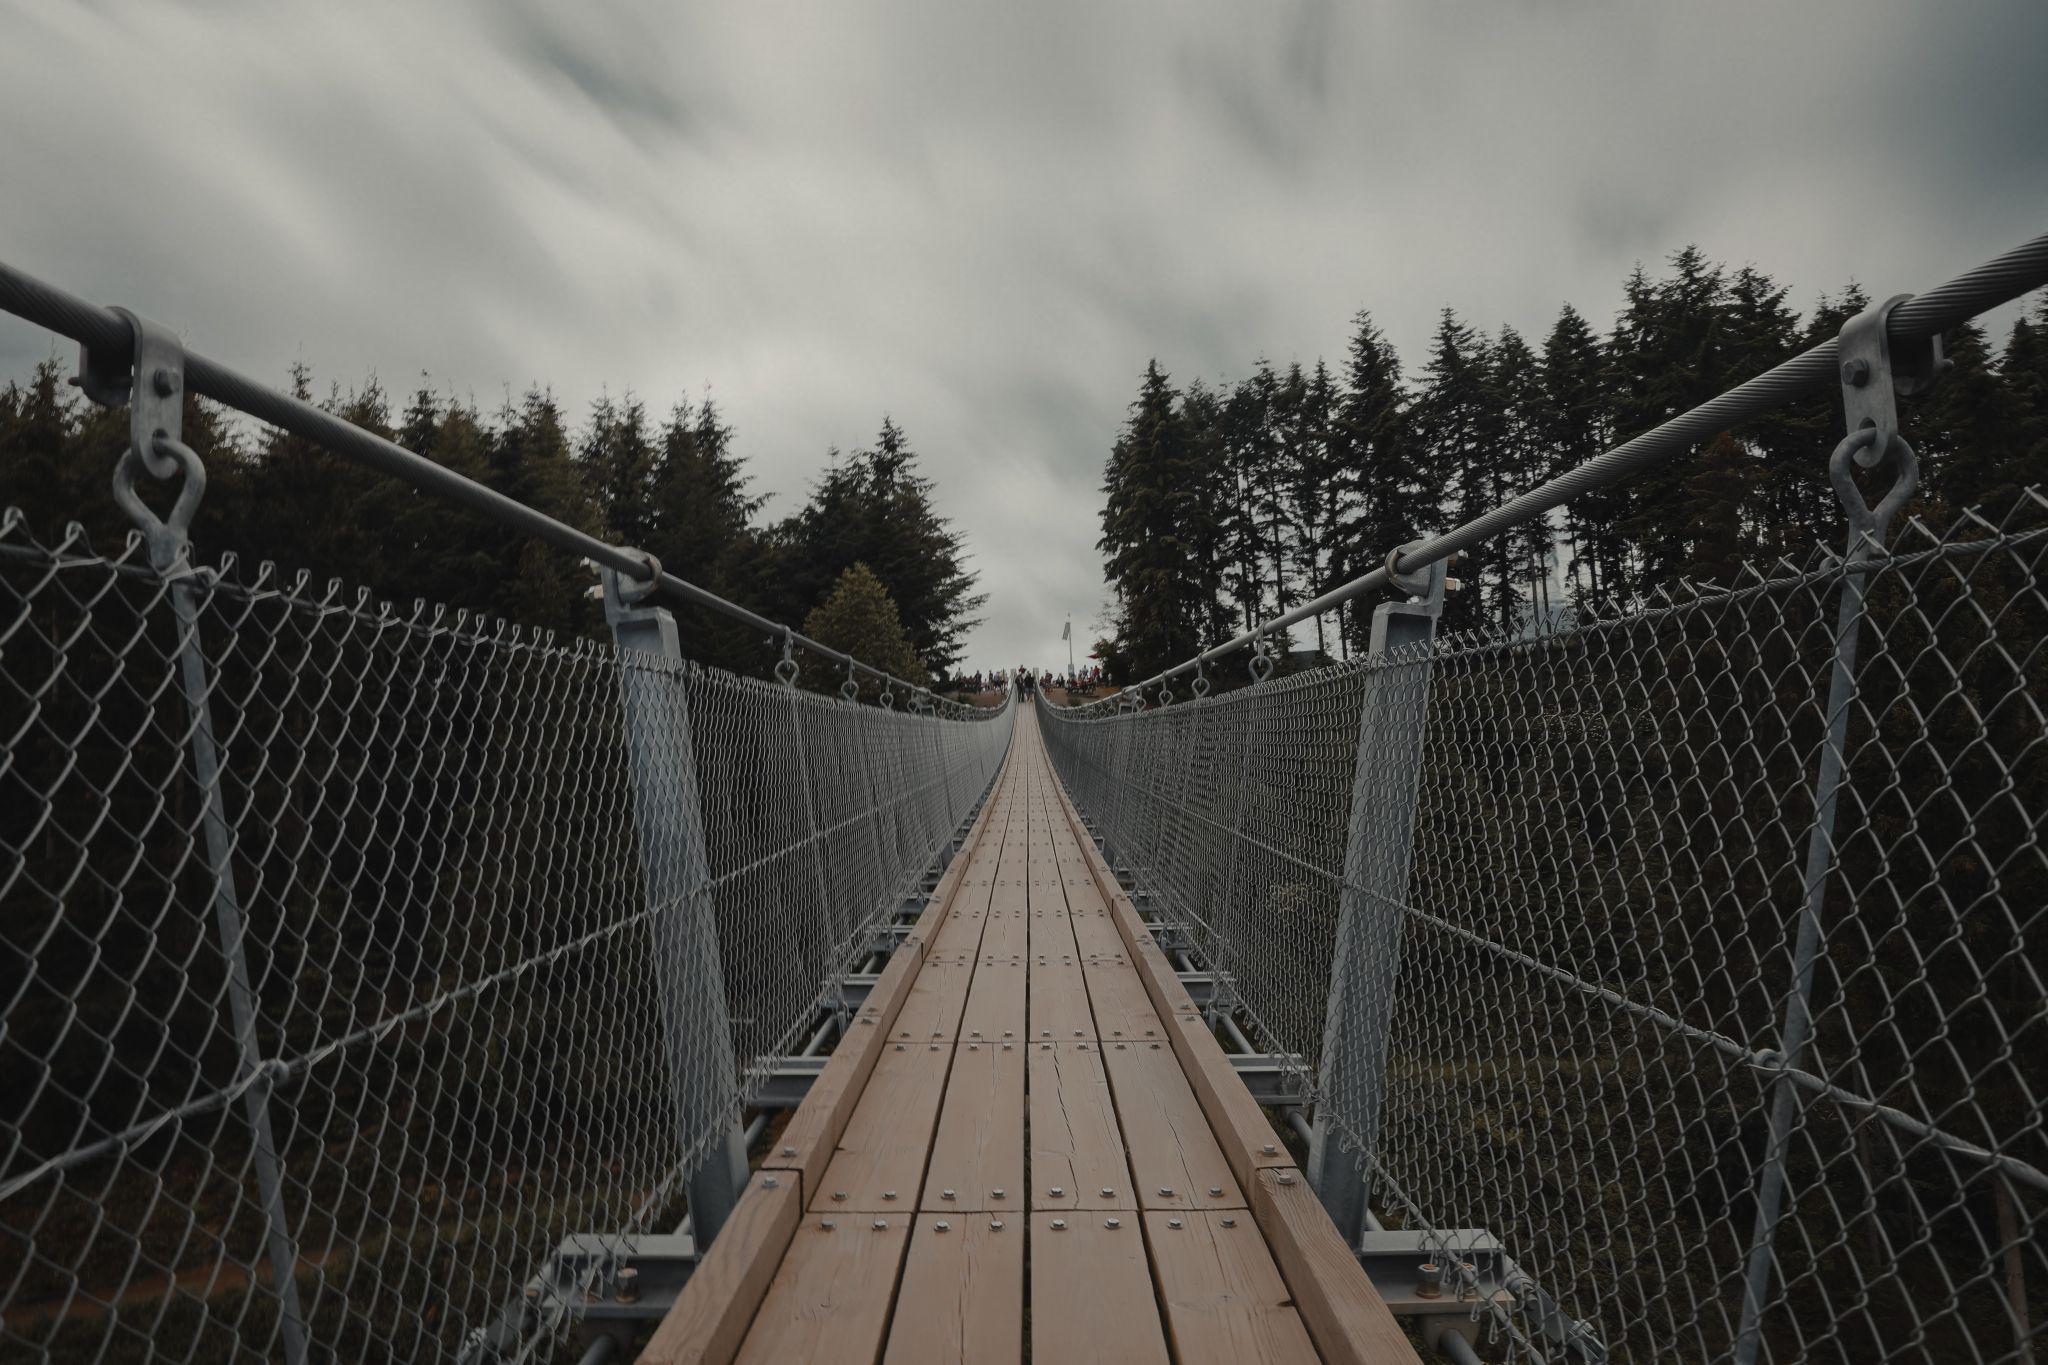 Hängeseilbrücke Geierlay, Germany